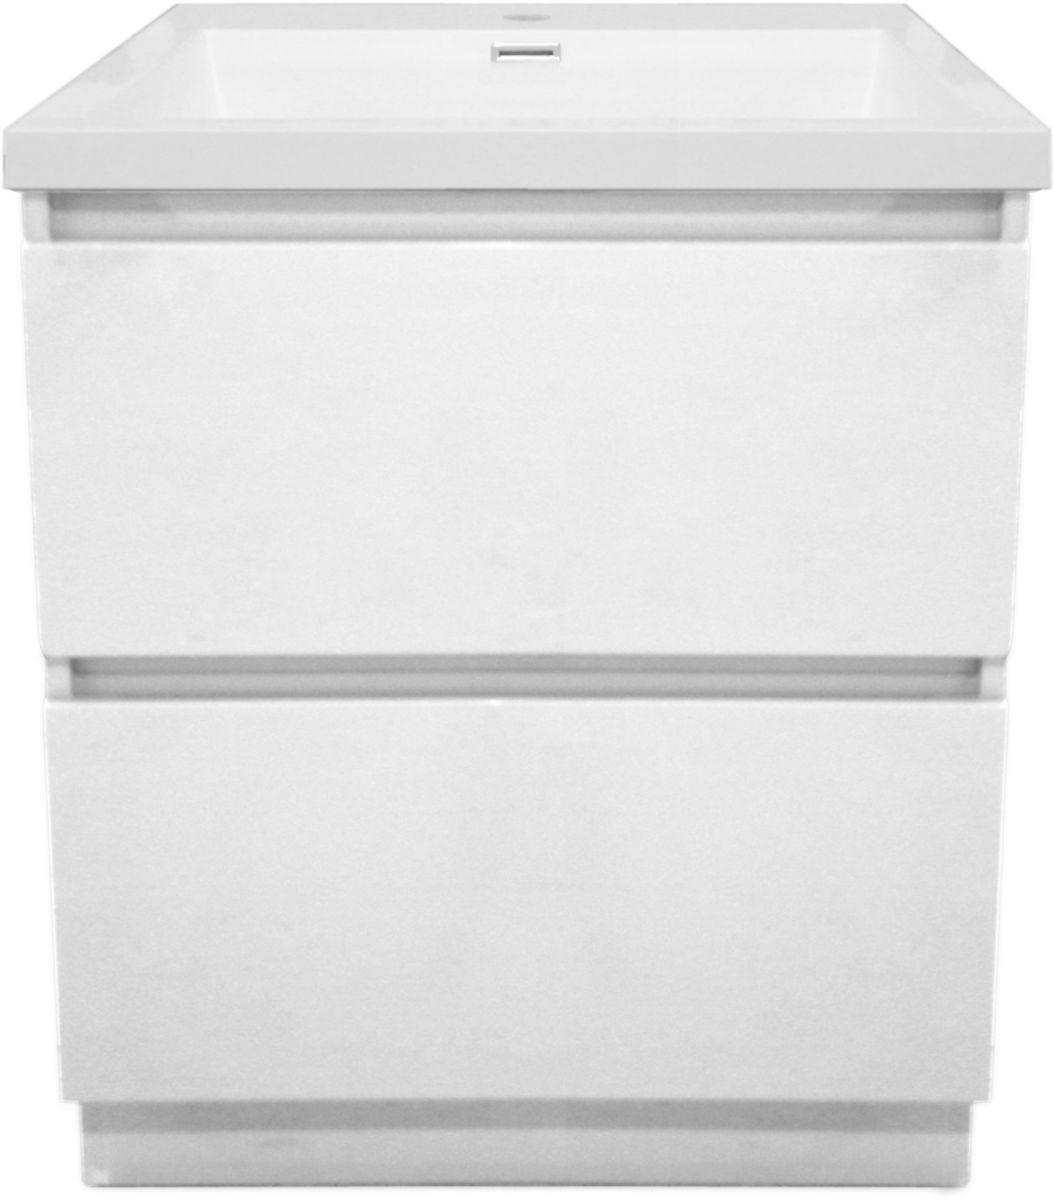 Meuble Primeo 60 cm au sol 2 tiroirs blanc ALTERNA Sanitaire CEDEO